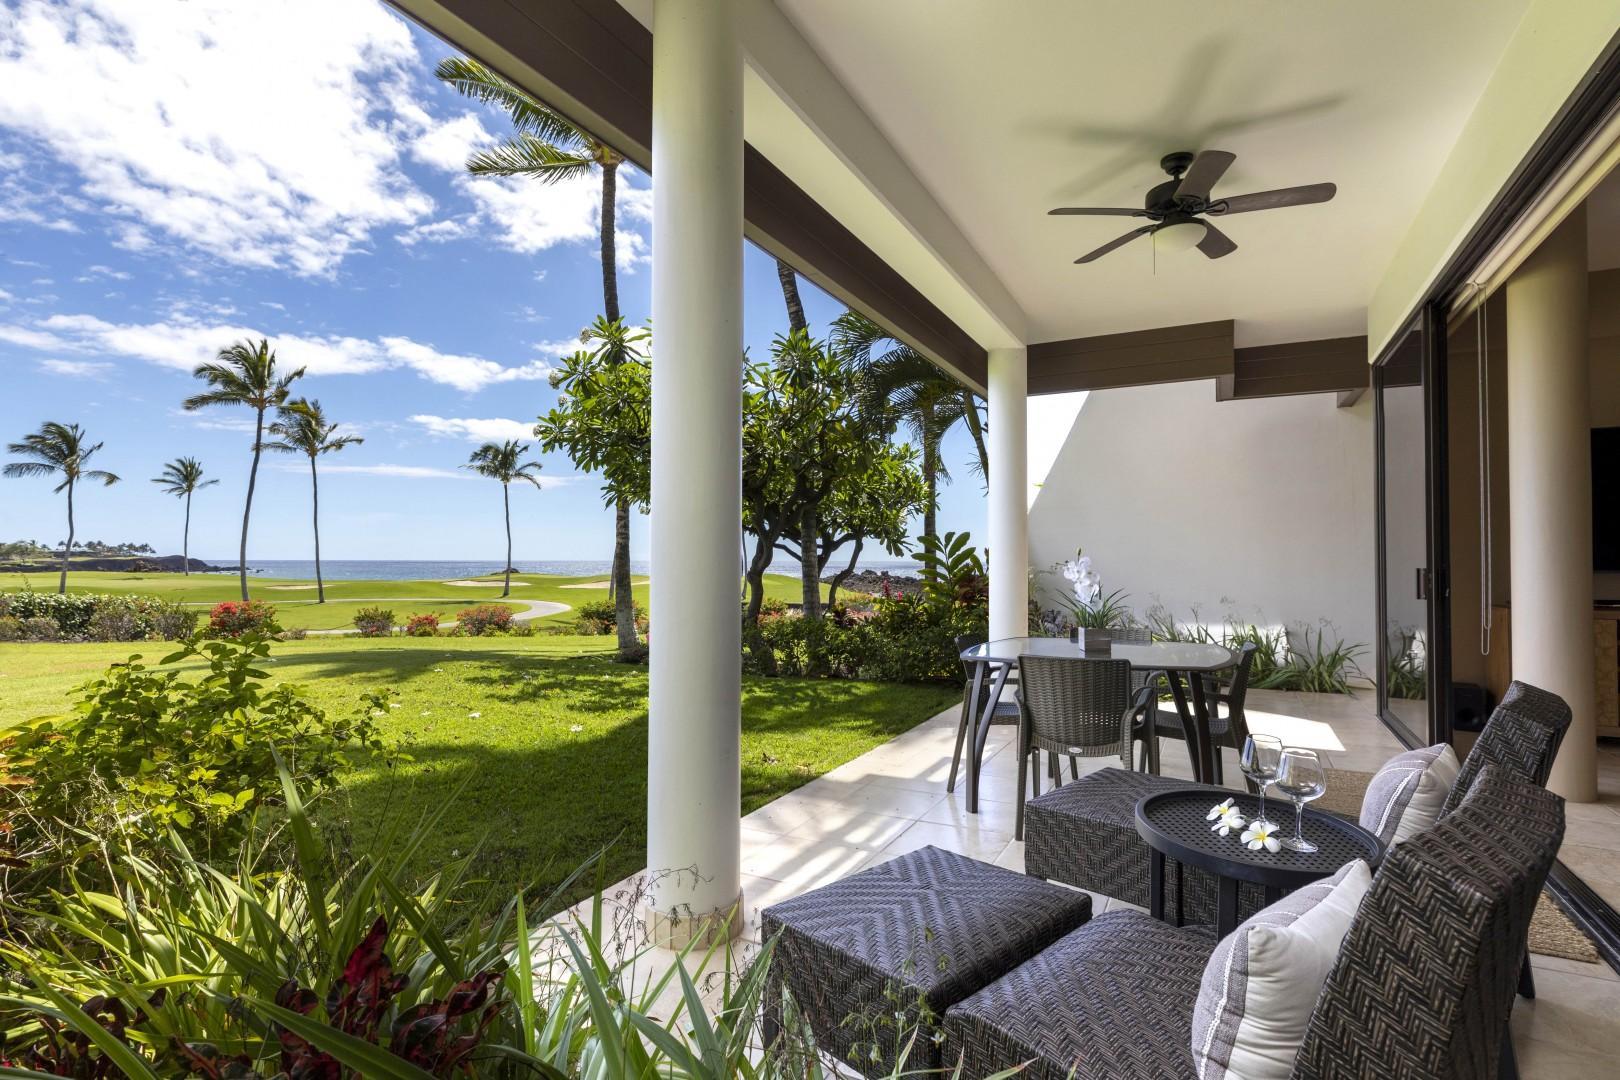 Enjoy alfresco dining or lounging on your ocean view lanai.